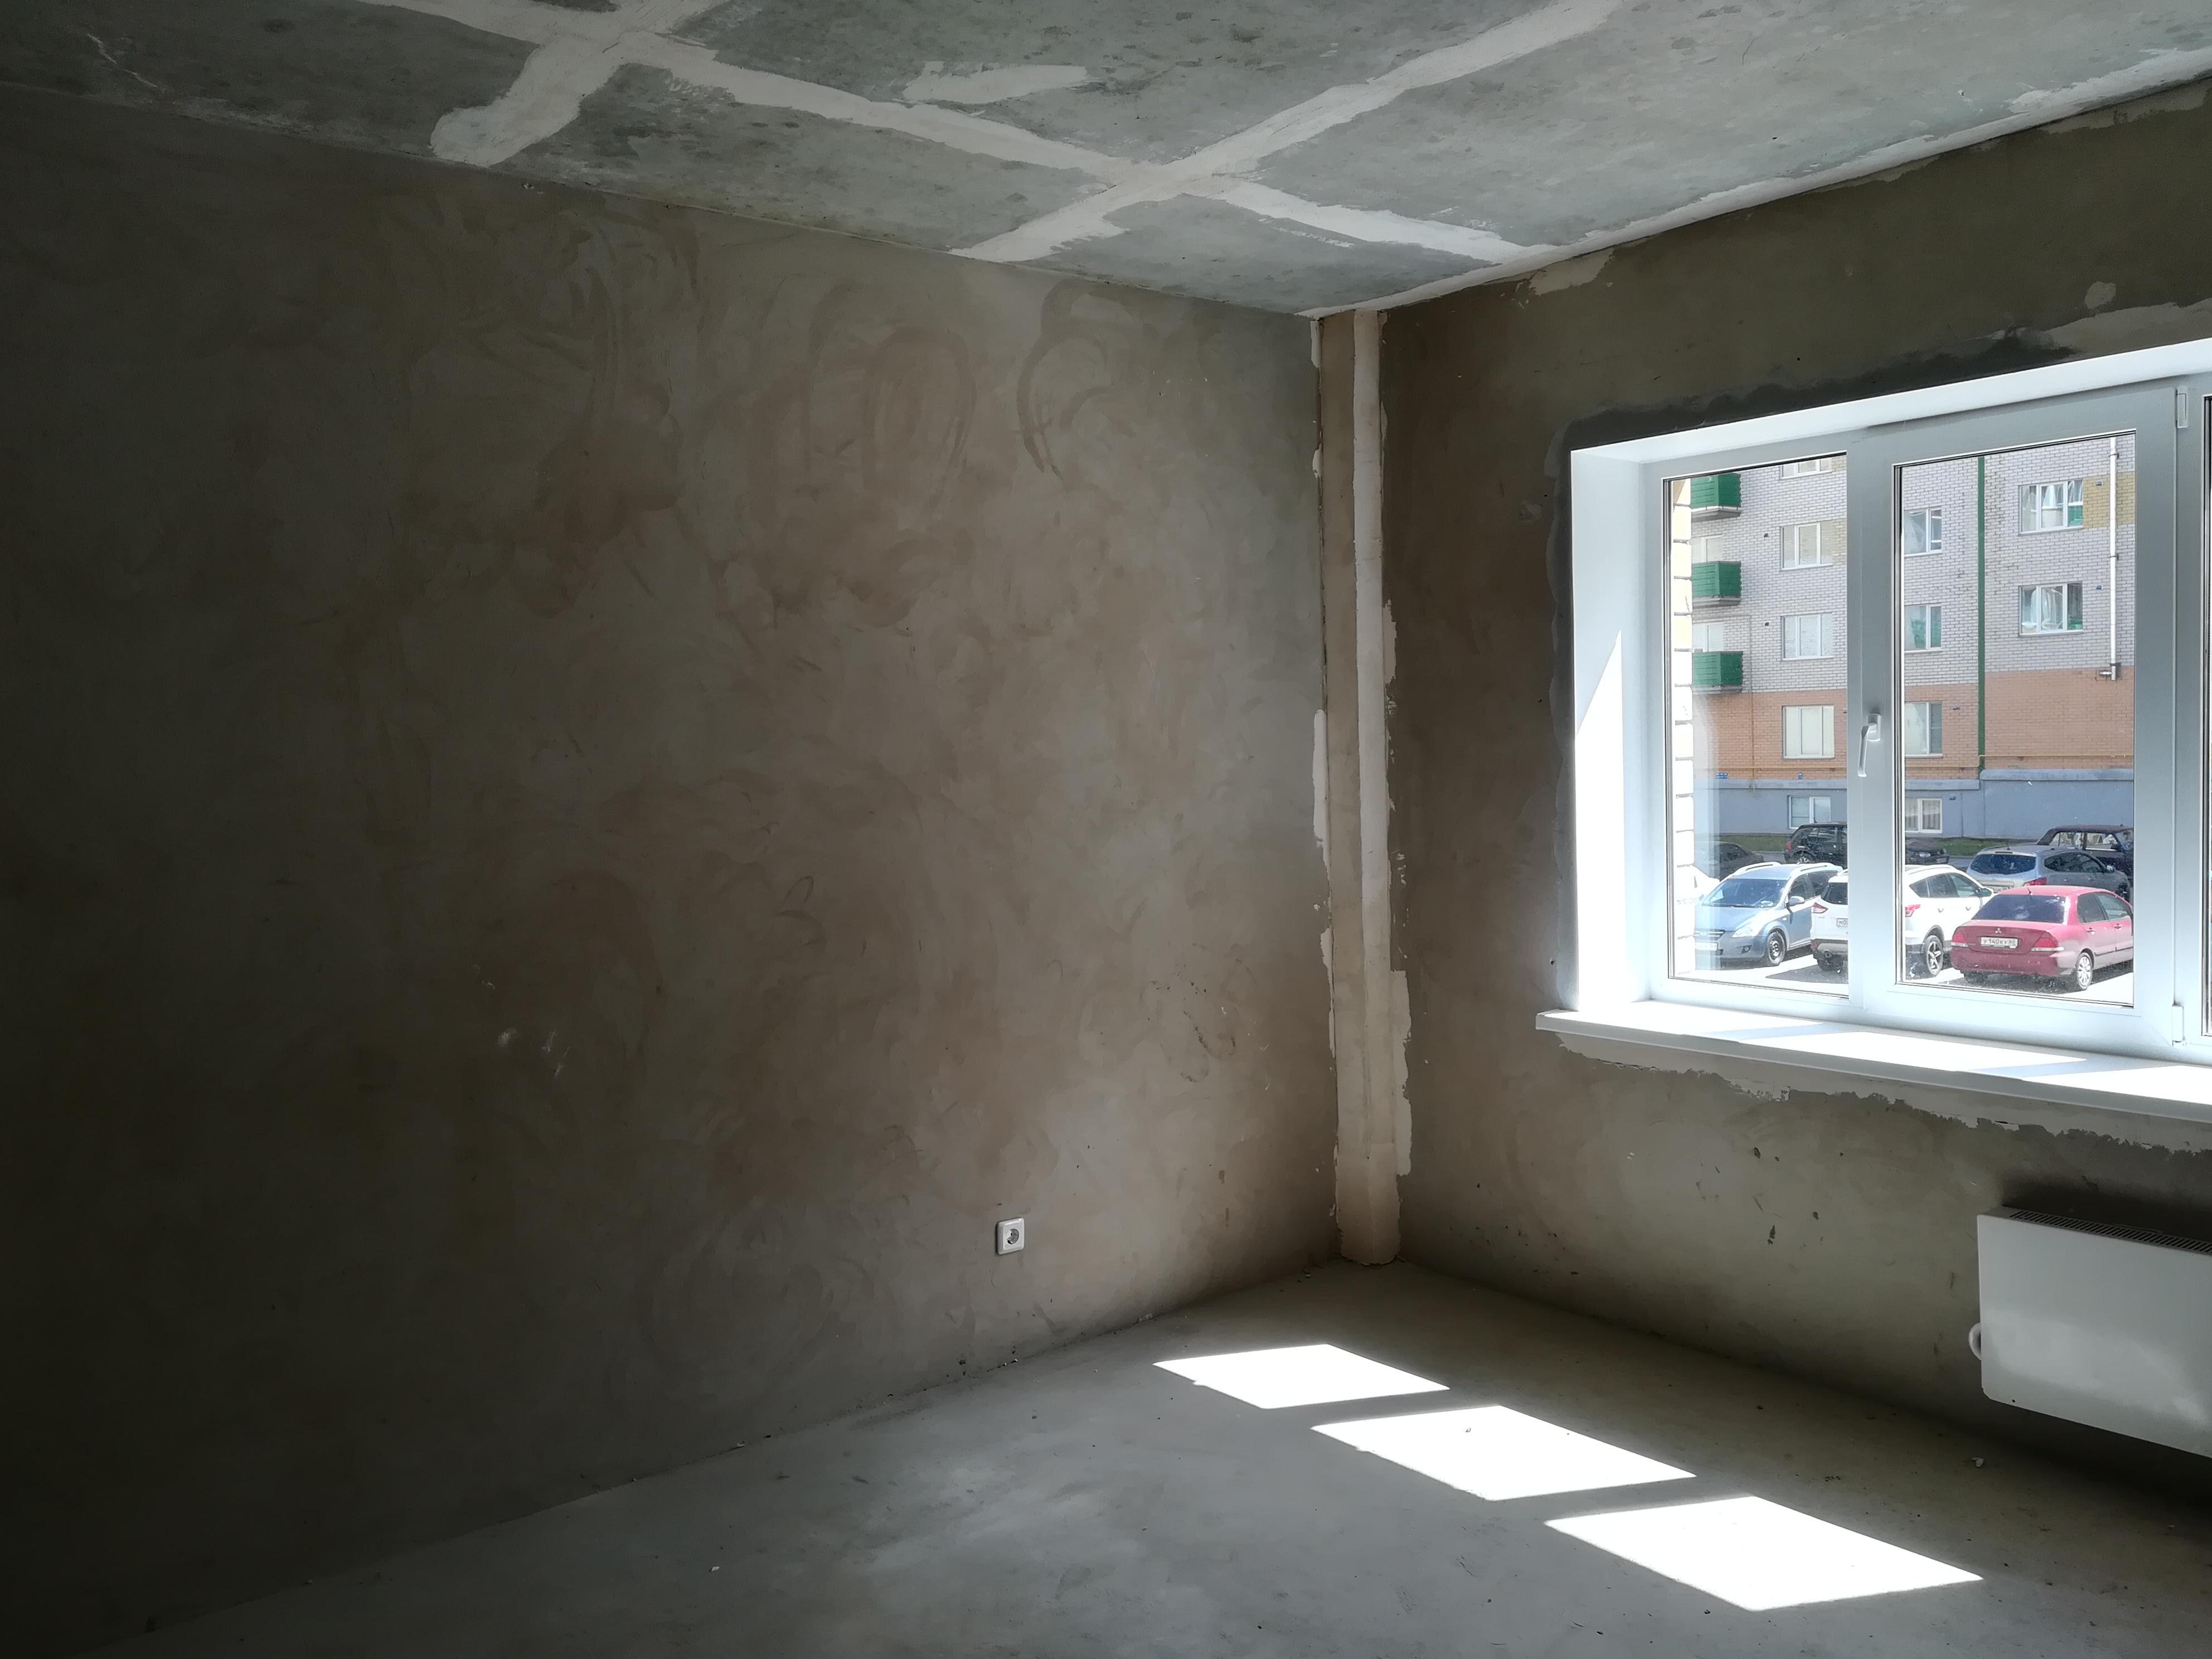 Двухкомнатная квартира - ул. Никольская, д. 5а